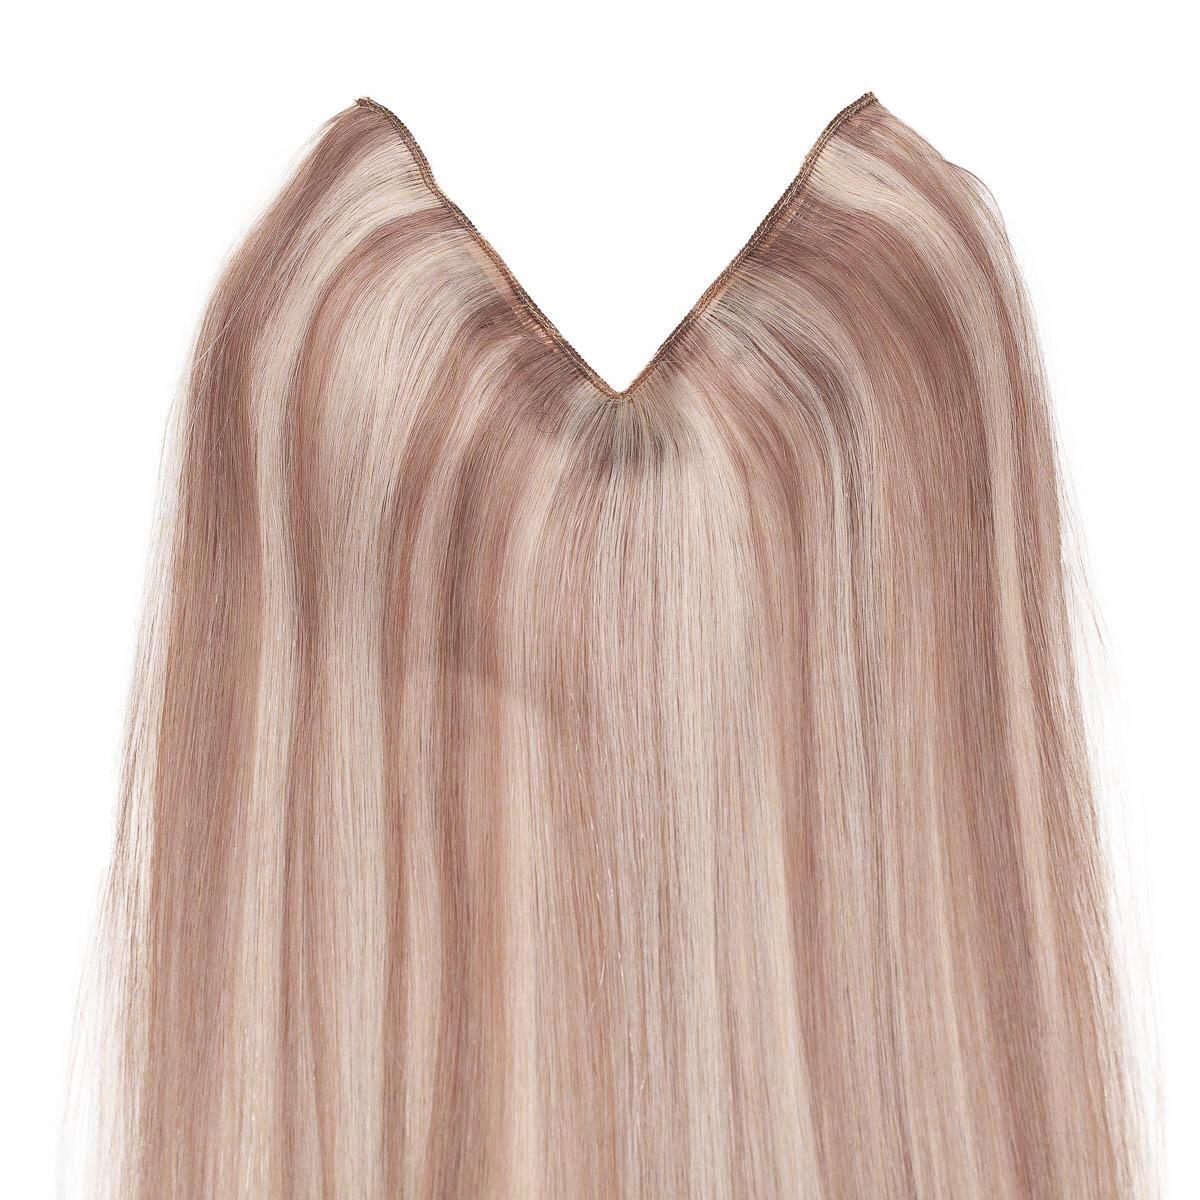 Easy Clip-in M7.3/10.8 Cendre Ash Blonde Mix 50 cm